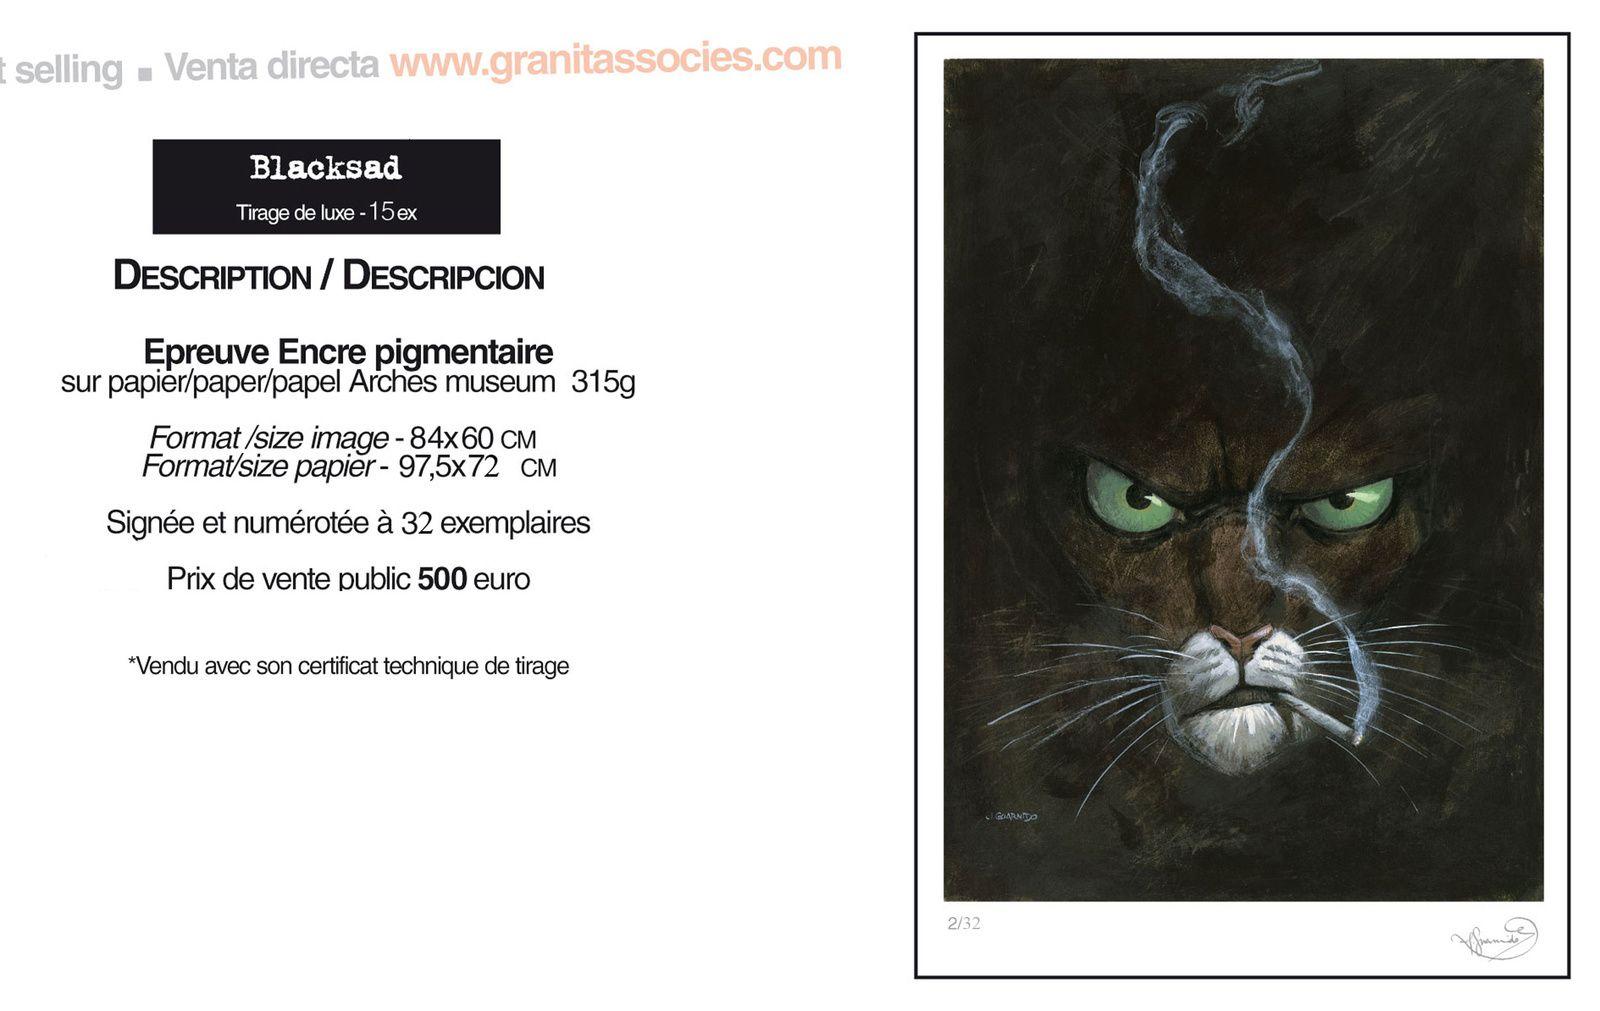 Blacksad - Deluxe Edition @ Granit Associés